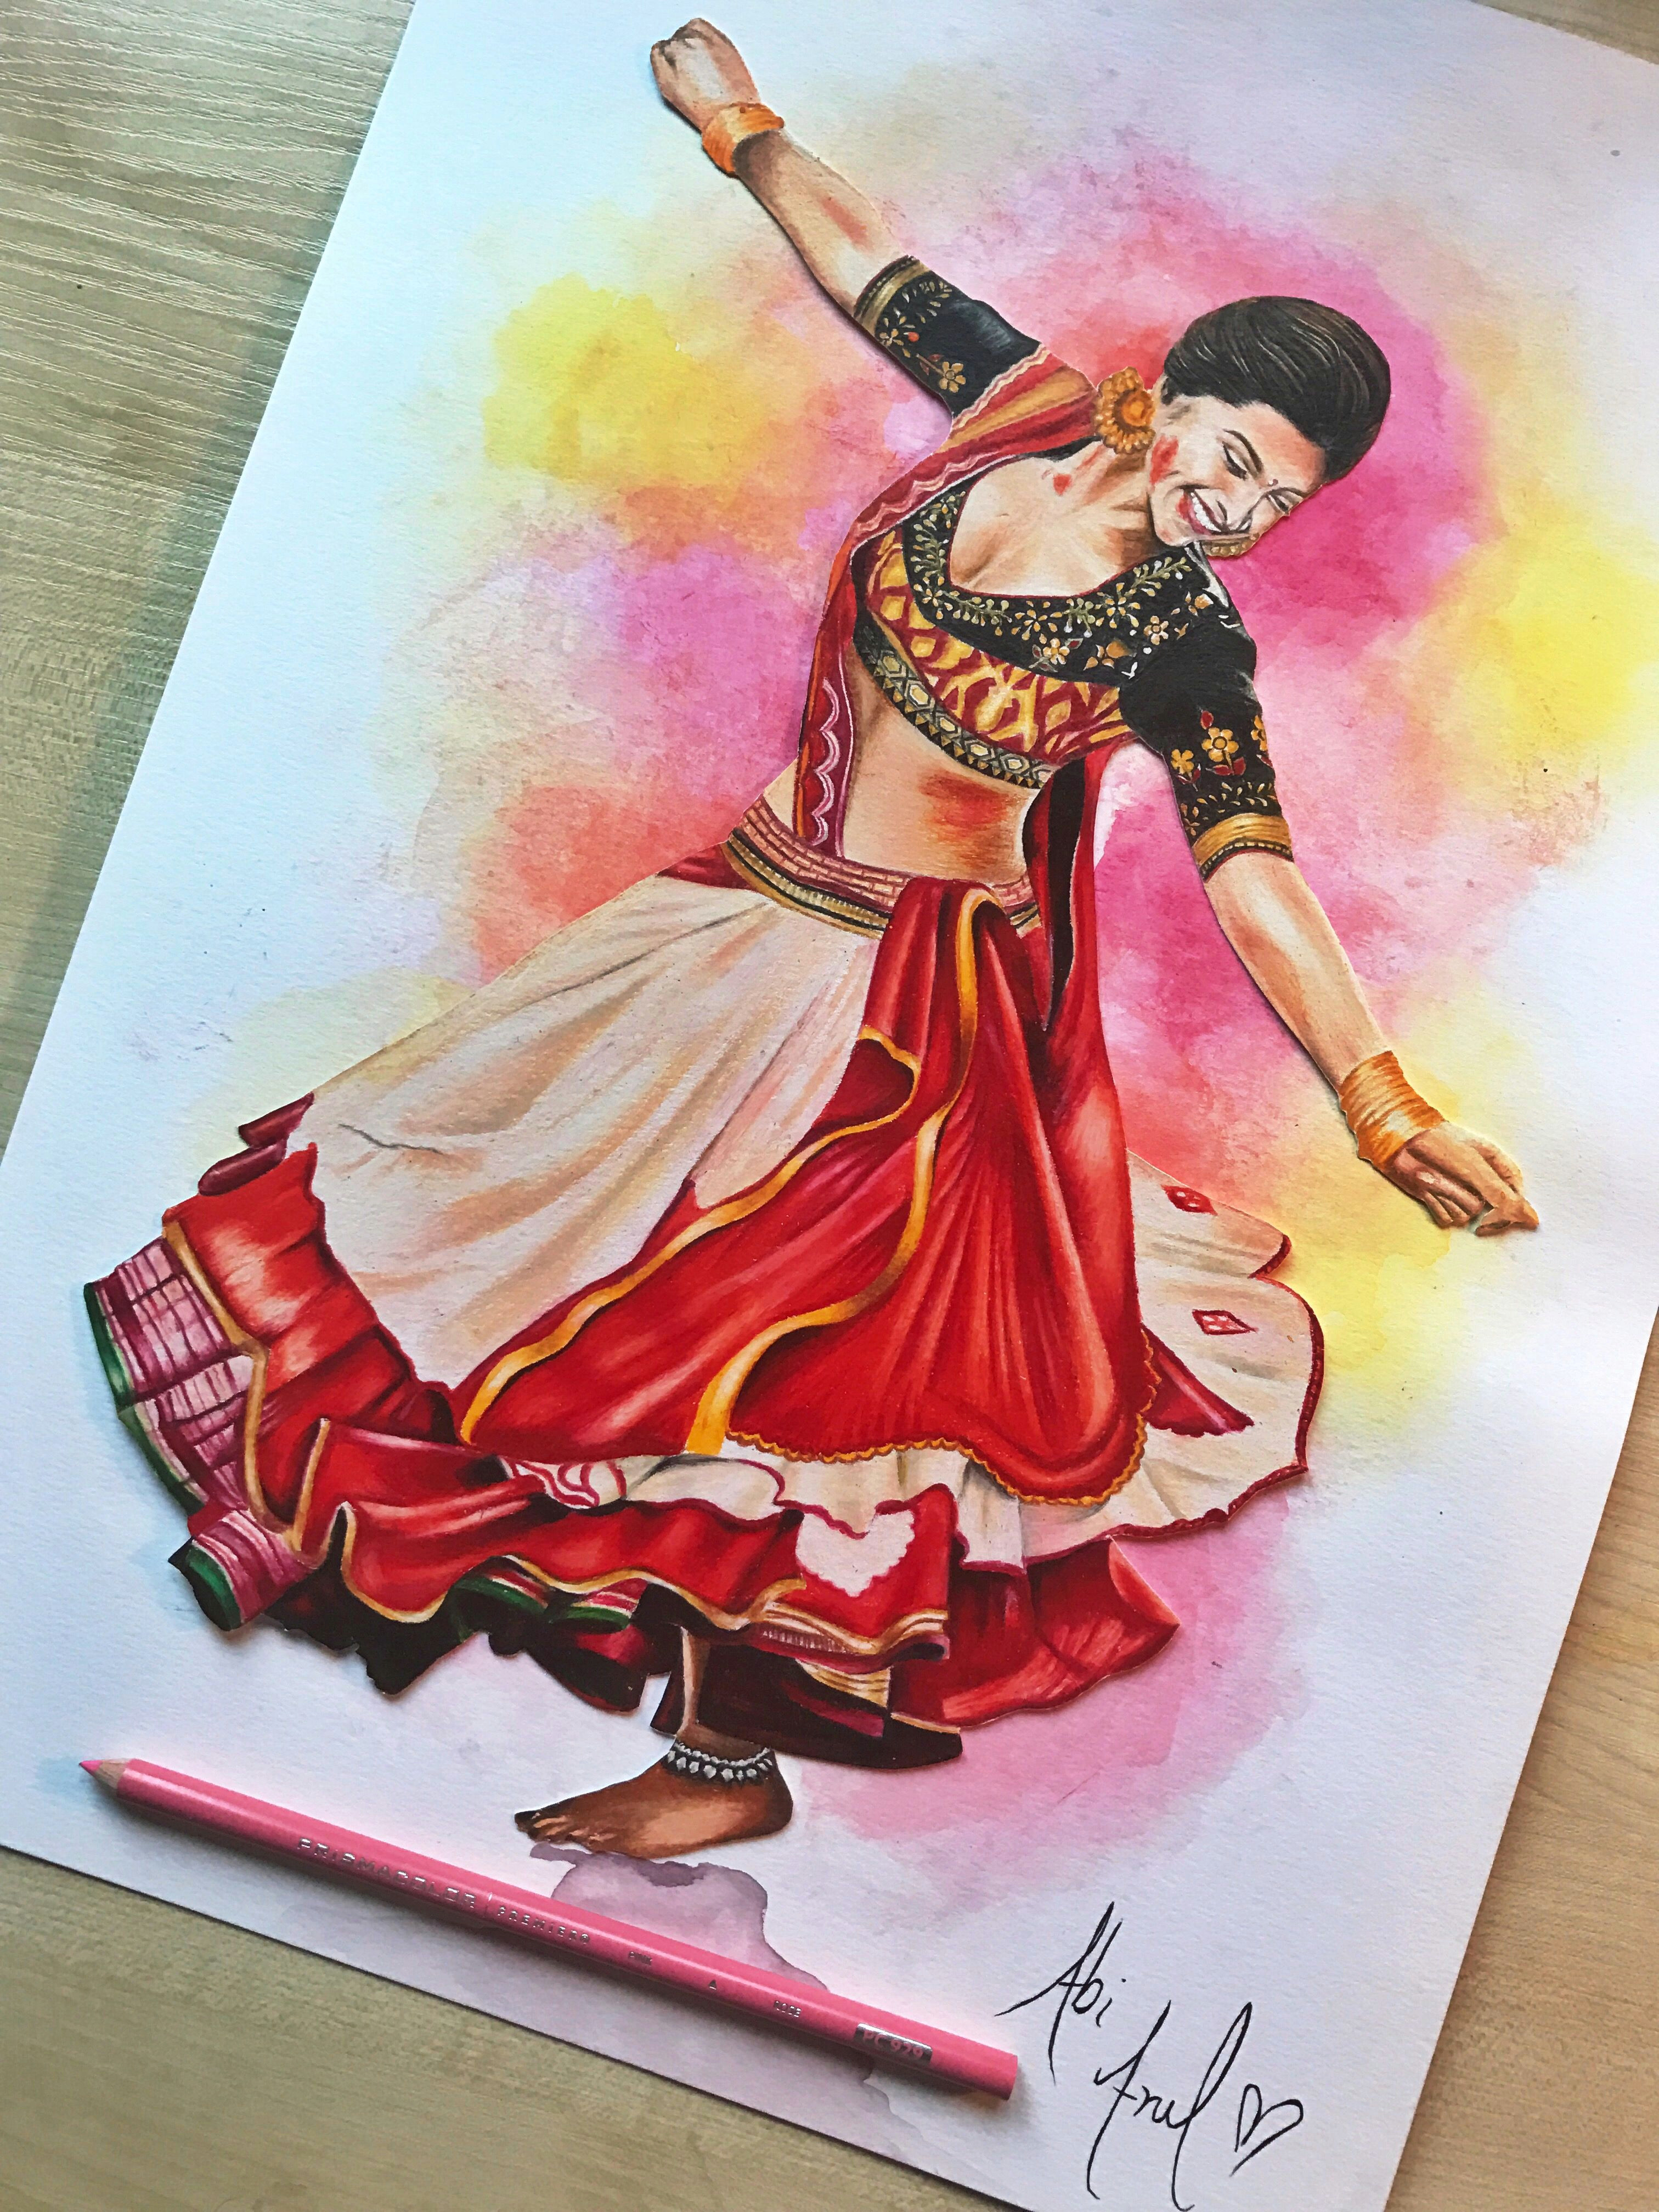 deepika padukone ram leela drawing prismacolors colouring pencils